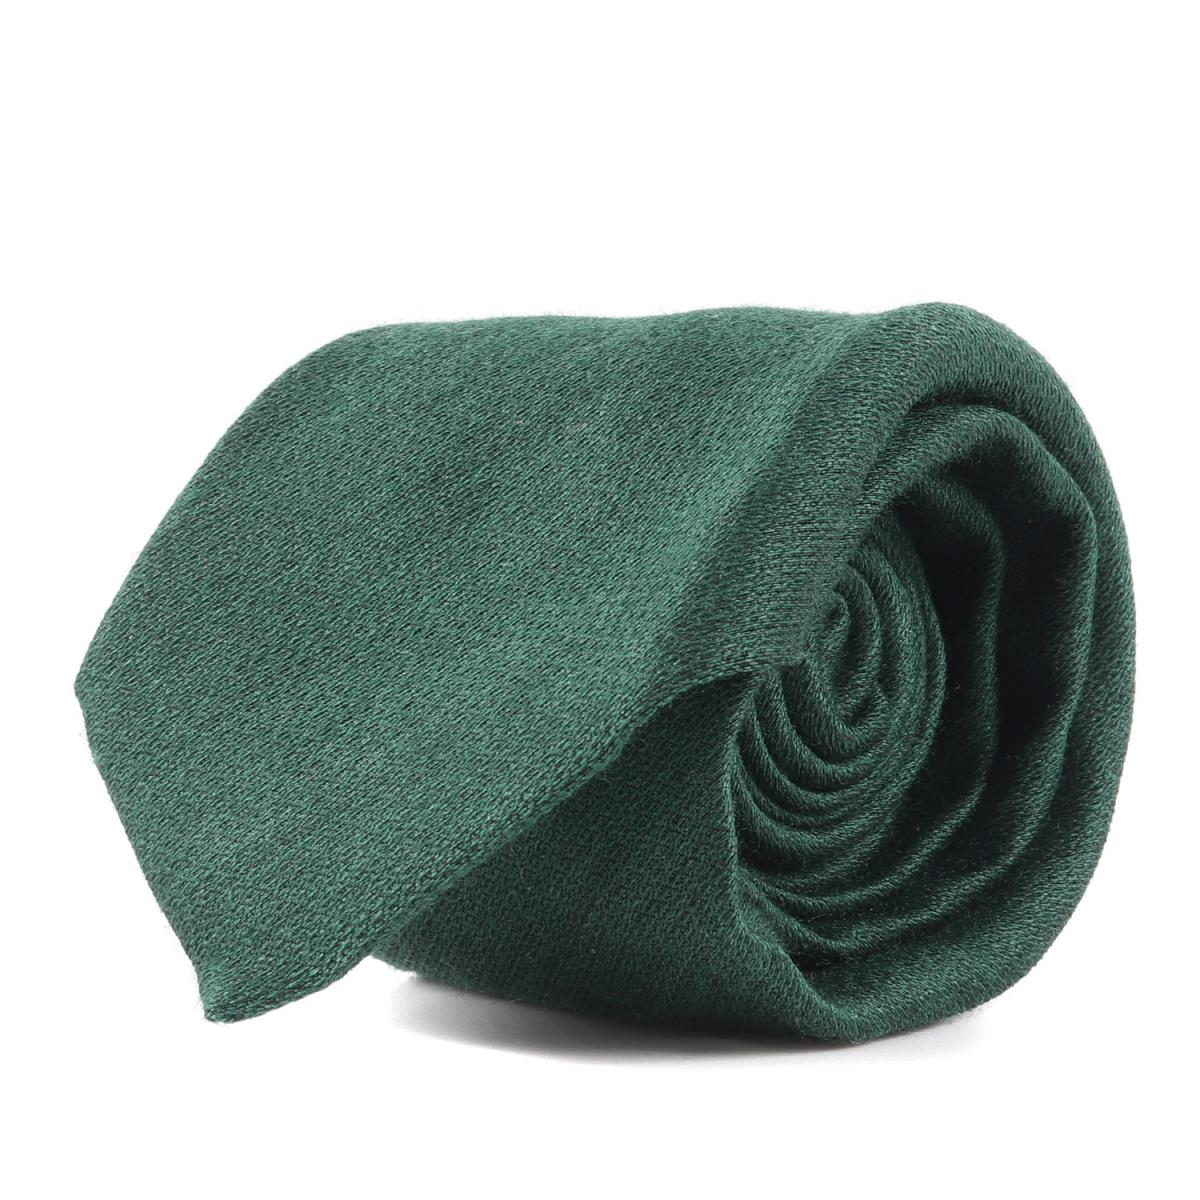 GUCCI (グッチ) ネクタイ 現行モデル タイガー刺繍シルクウールネクタイ グリーン 【メンズ】【中古】【美品】【K2424】【あす楽☆対応可】